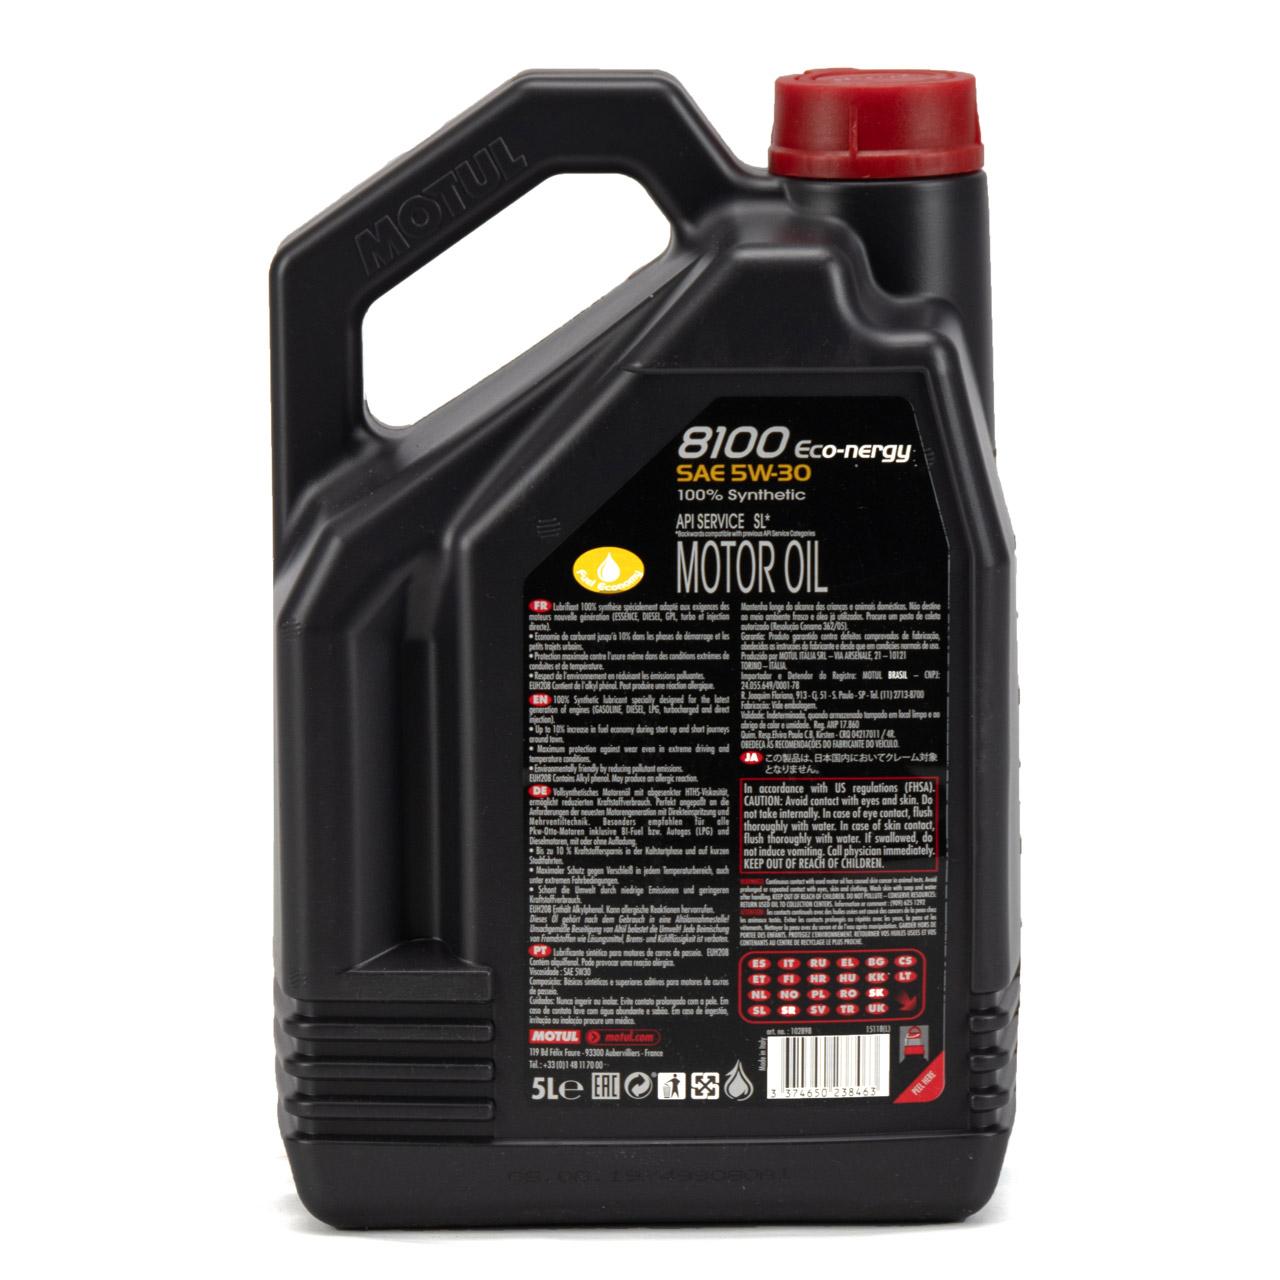 5 Liter 5L MOTUL 8100 ECO-nergy Motoröl Öl 5W30 FORD WSS M2C 913D RENAULT RN0700